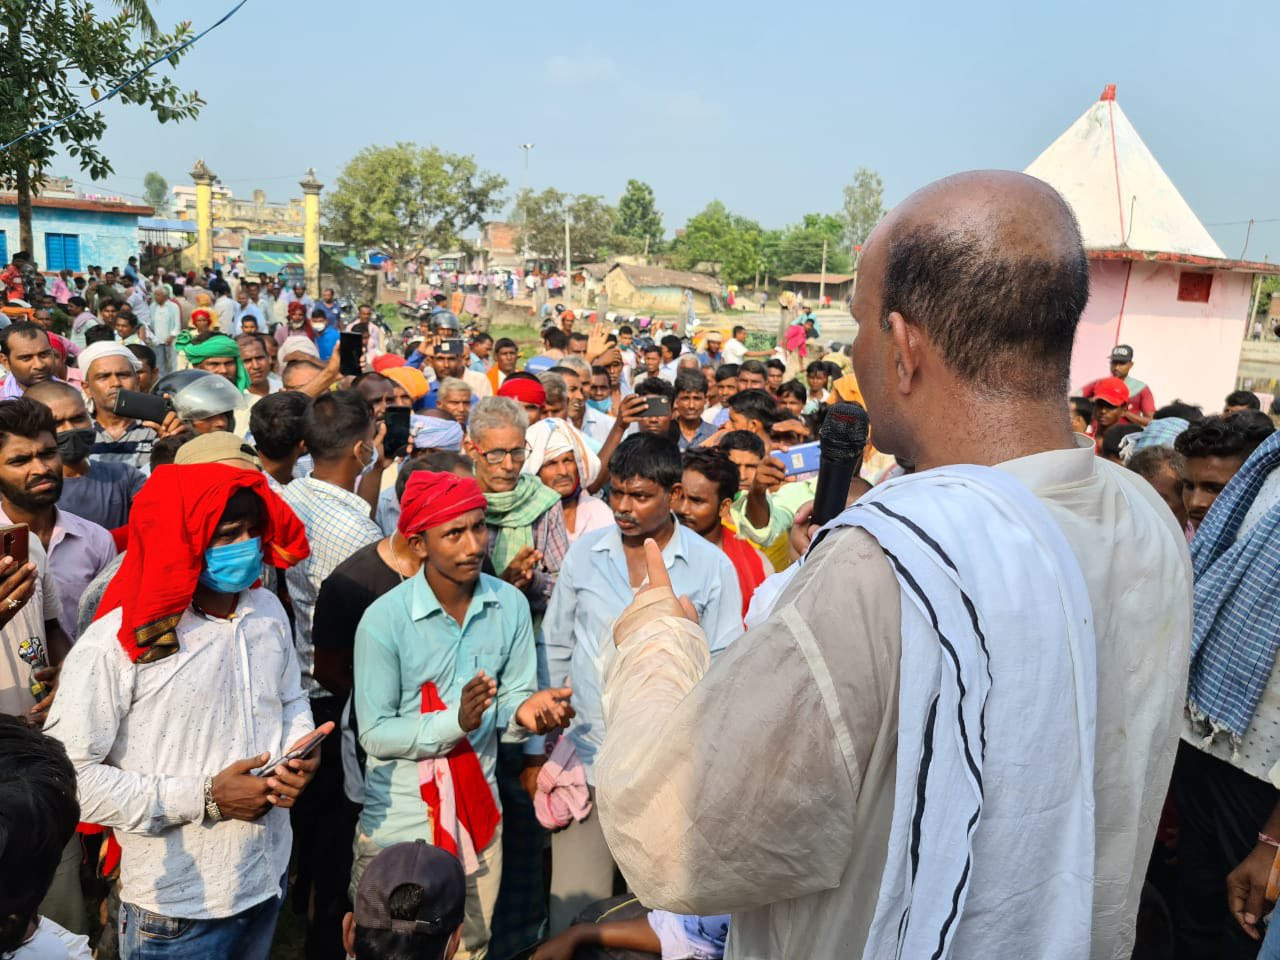 NC lawmaker Amresh Kumar Singh addressing the crowd.